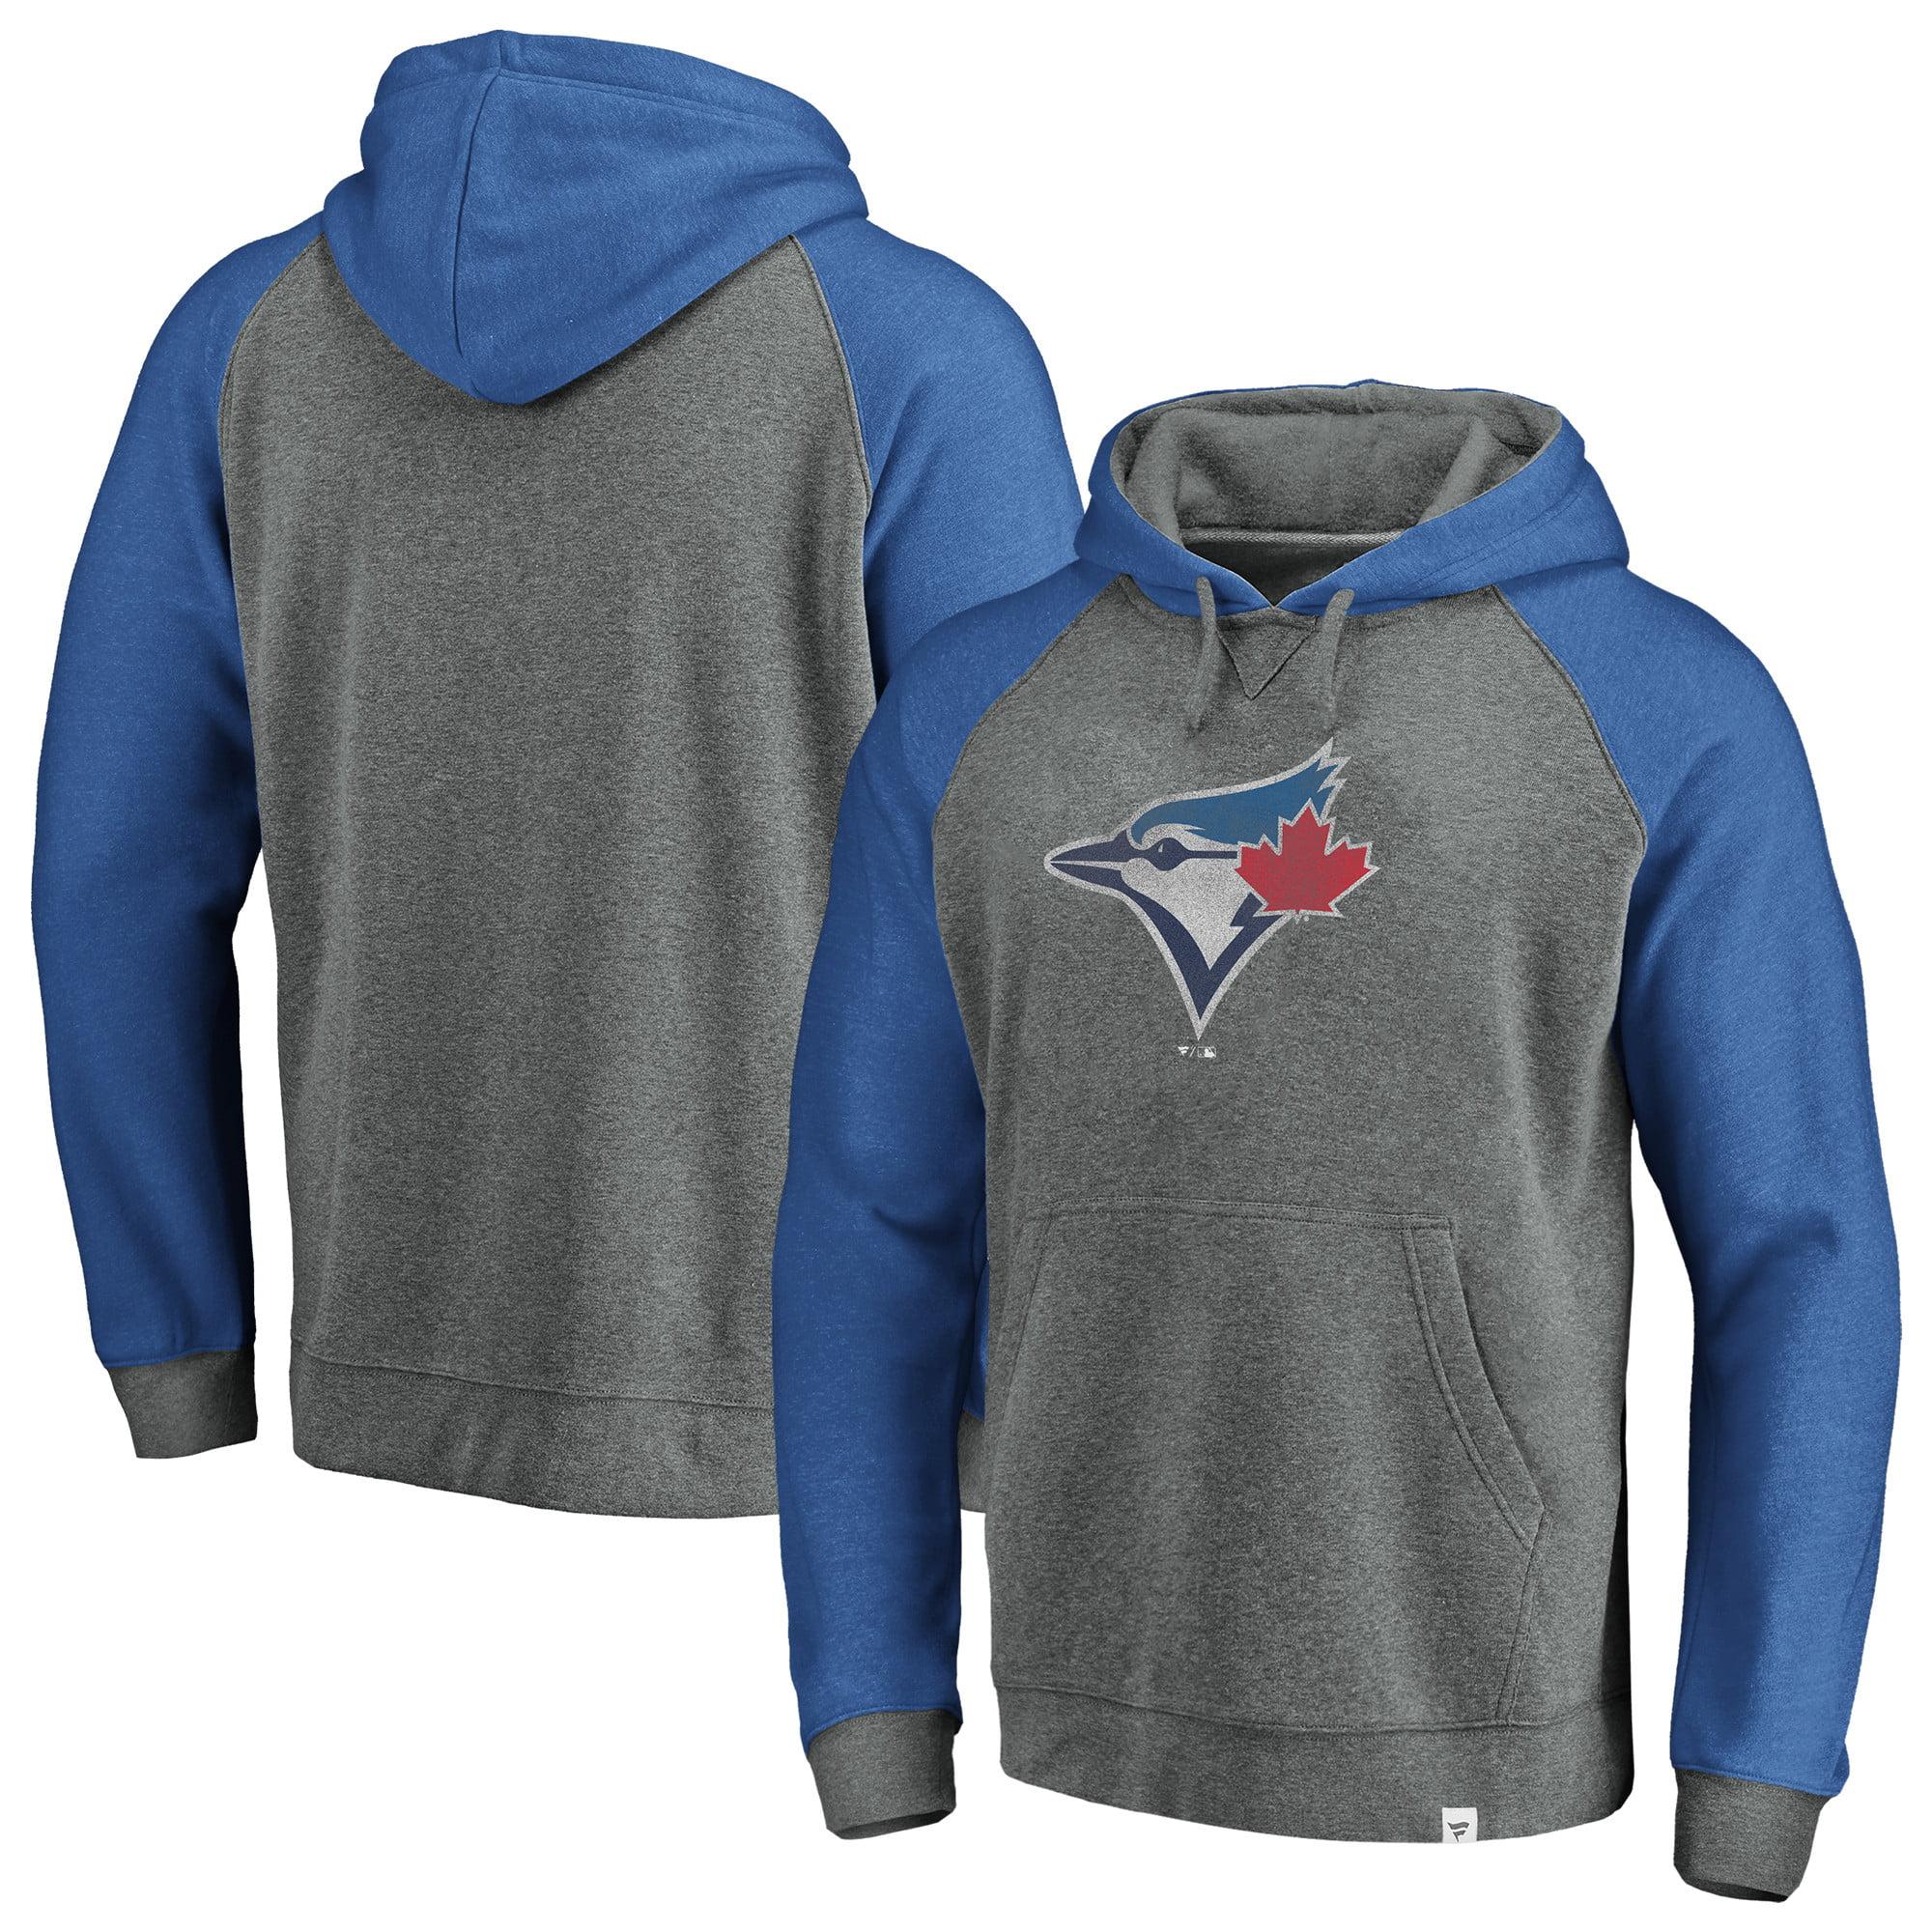 Toronto Blue Jays Fanatics Branded Team Logo Tri-Blend Pullover Hoodie - Gray/Royal